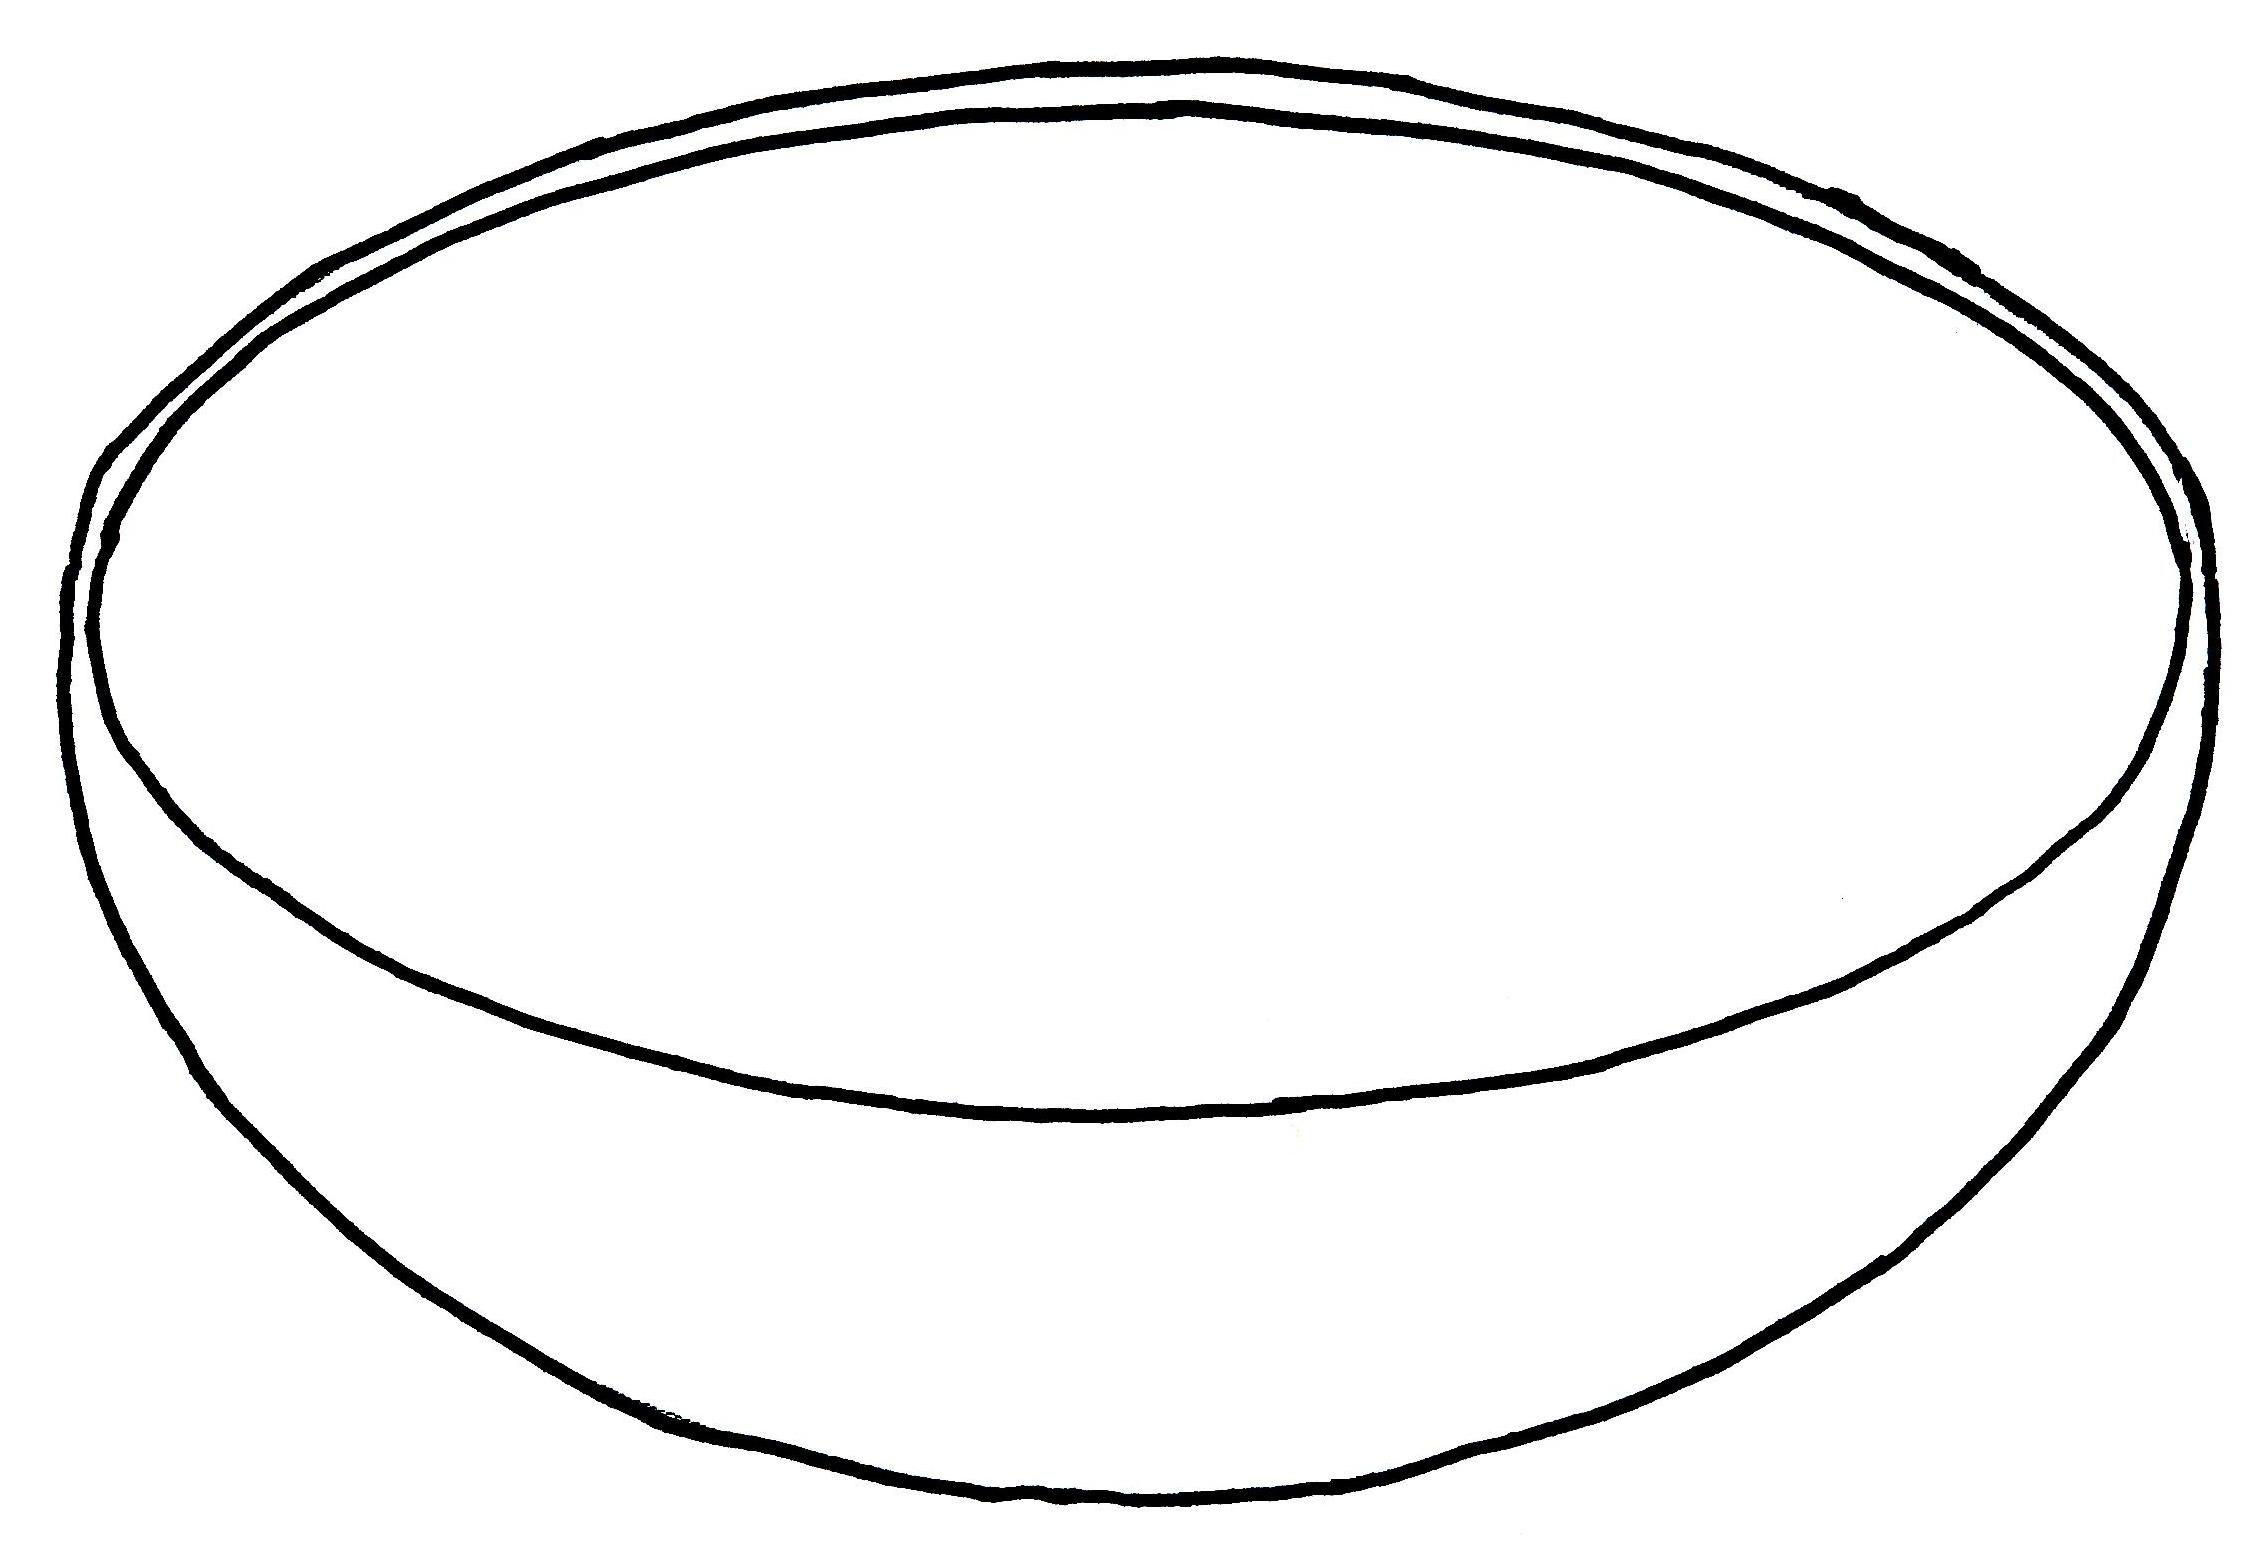 Bowl clipart black and white clip transparent download Bowl clipart black and white 2 » Clipart Portal clip transparent download